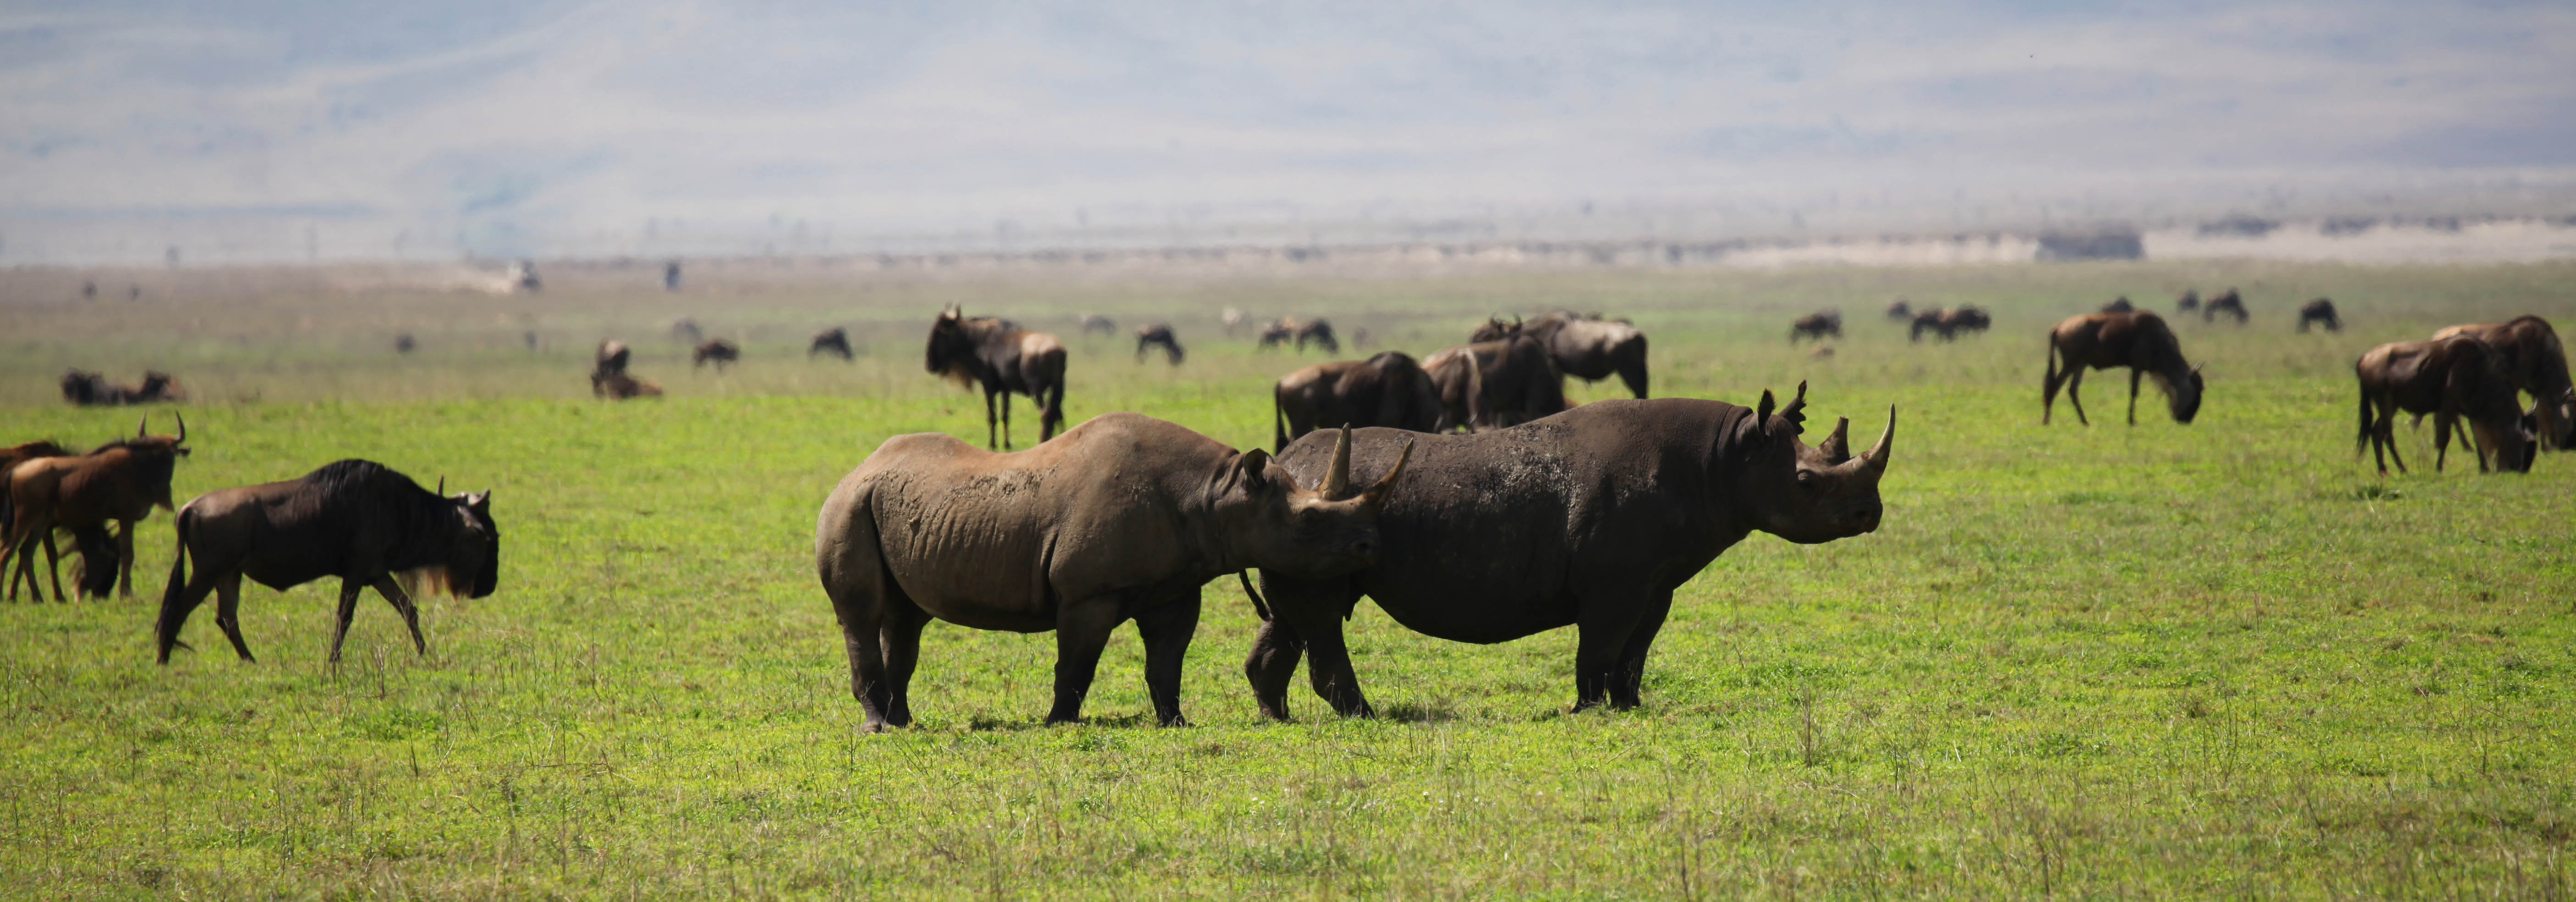 Black Rhinos in Tanzania's Ngorongoro Crater